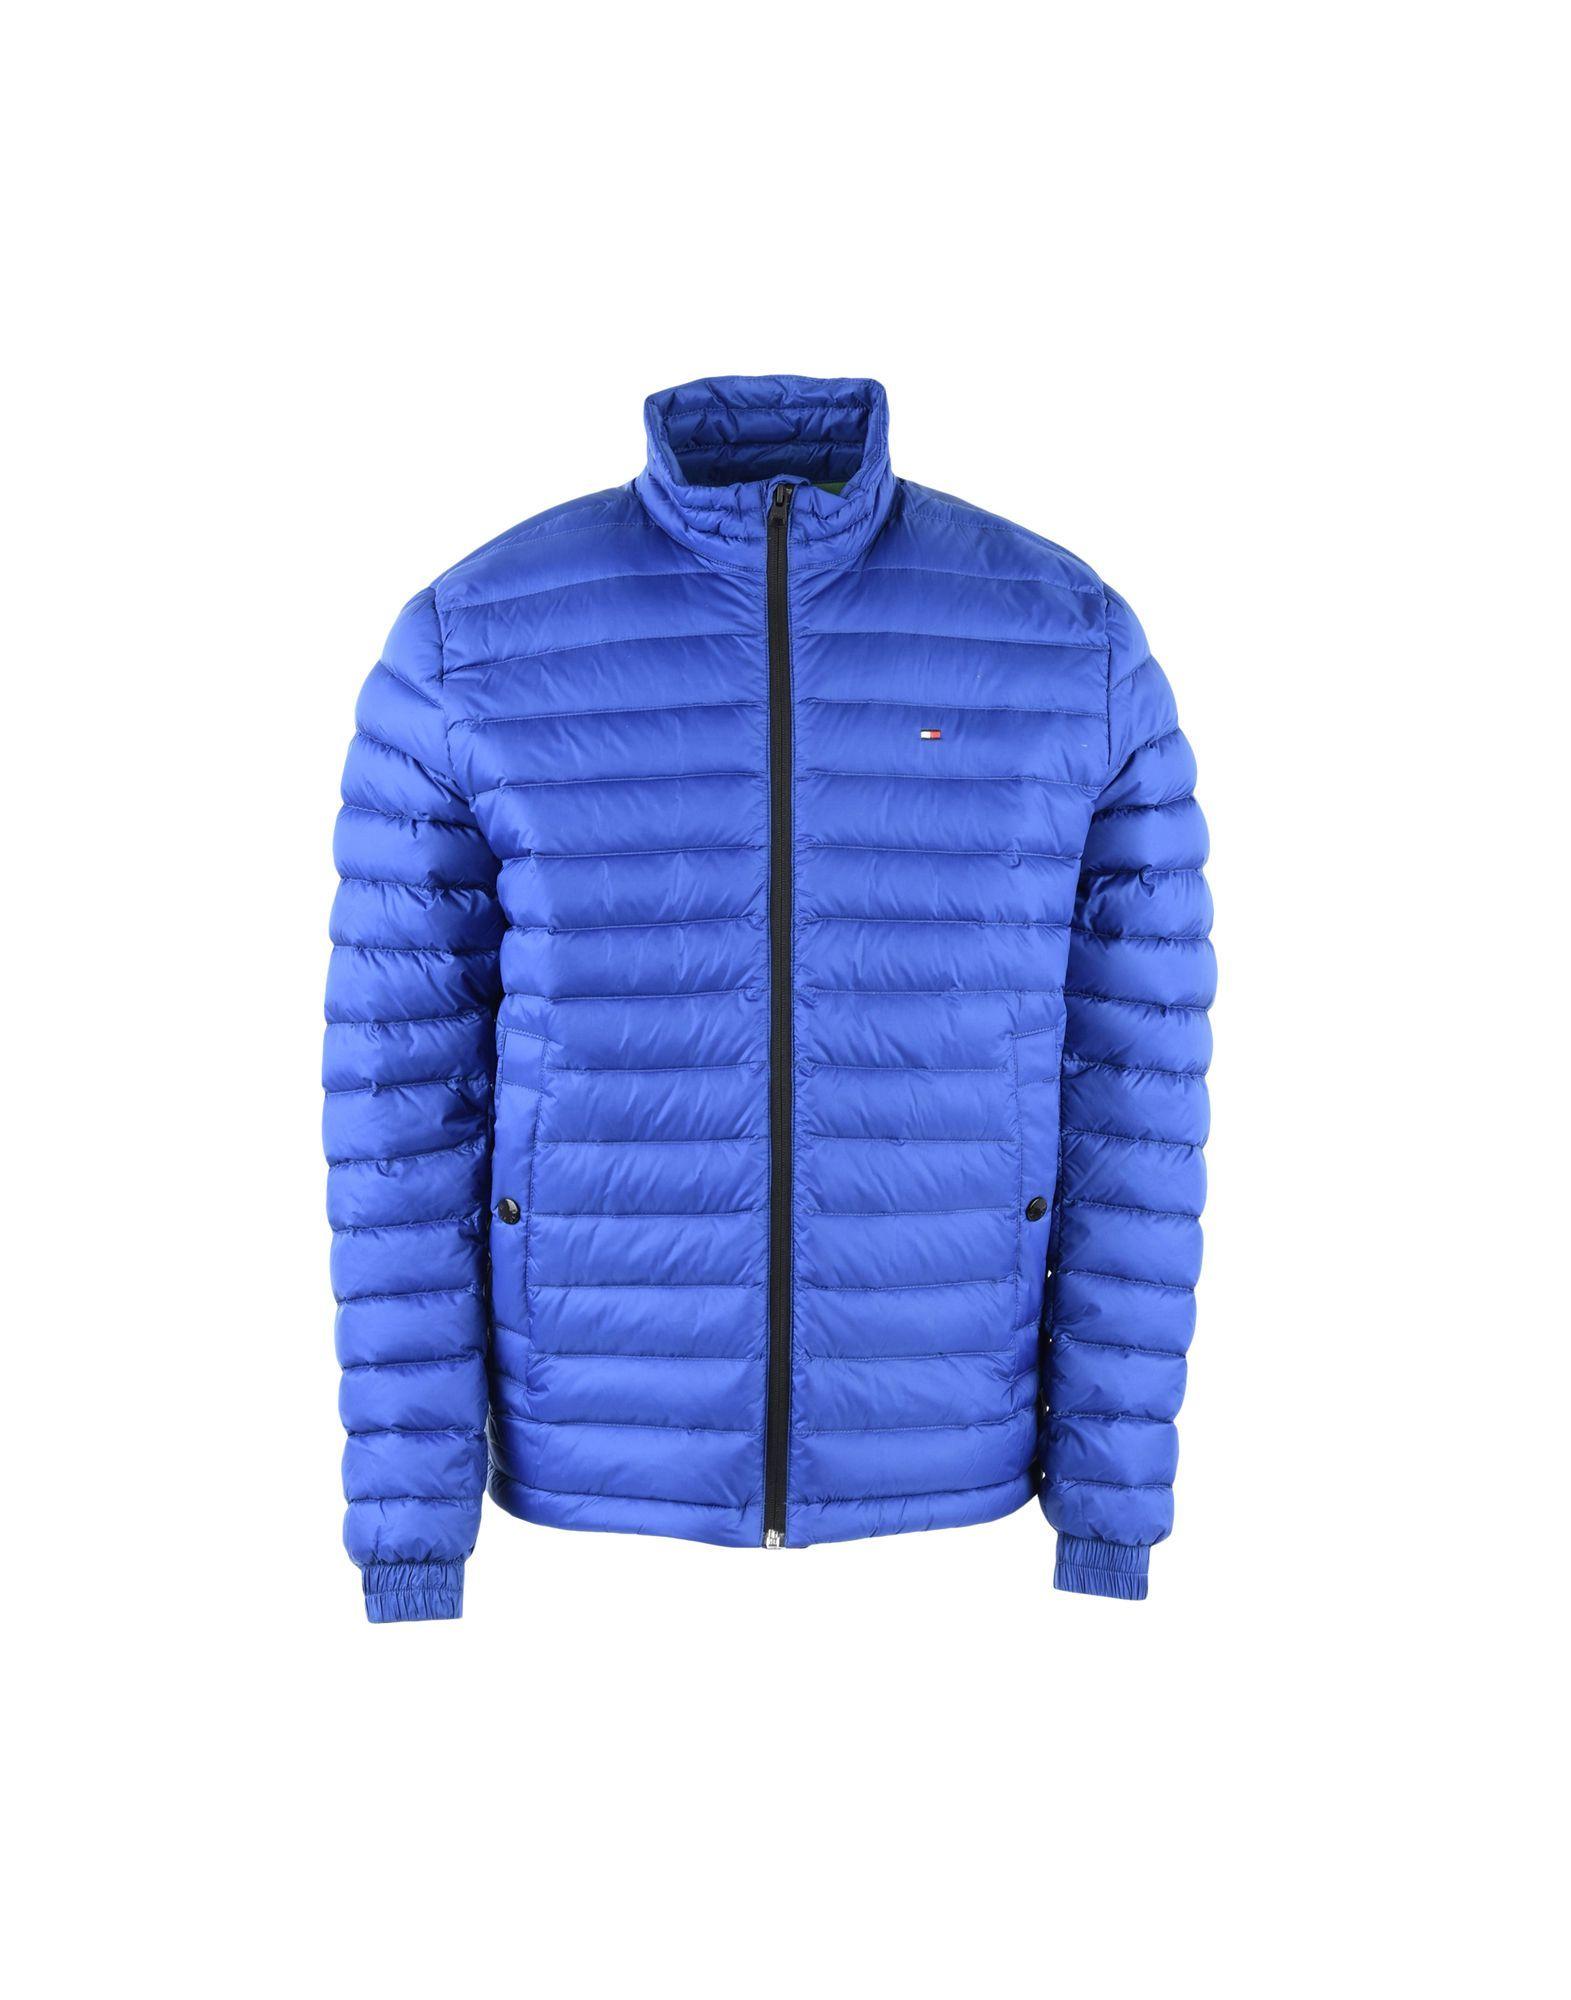 Brandneu Straßenpreis heißer verkauf billig Blue USA Down Jackets | Jackets | Men's coats, jackets ...